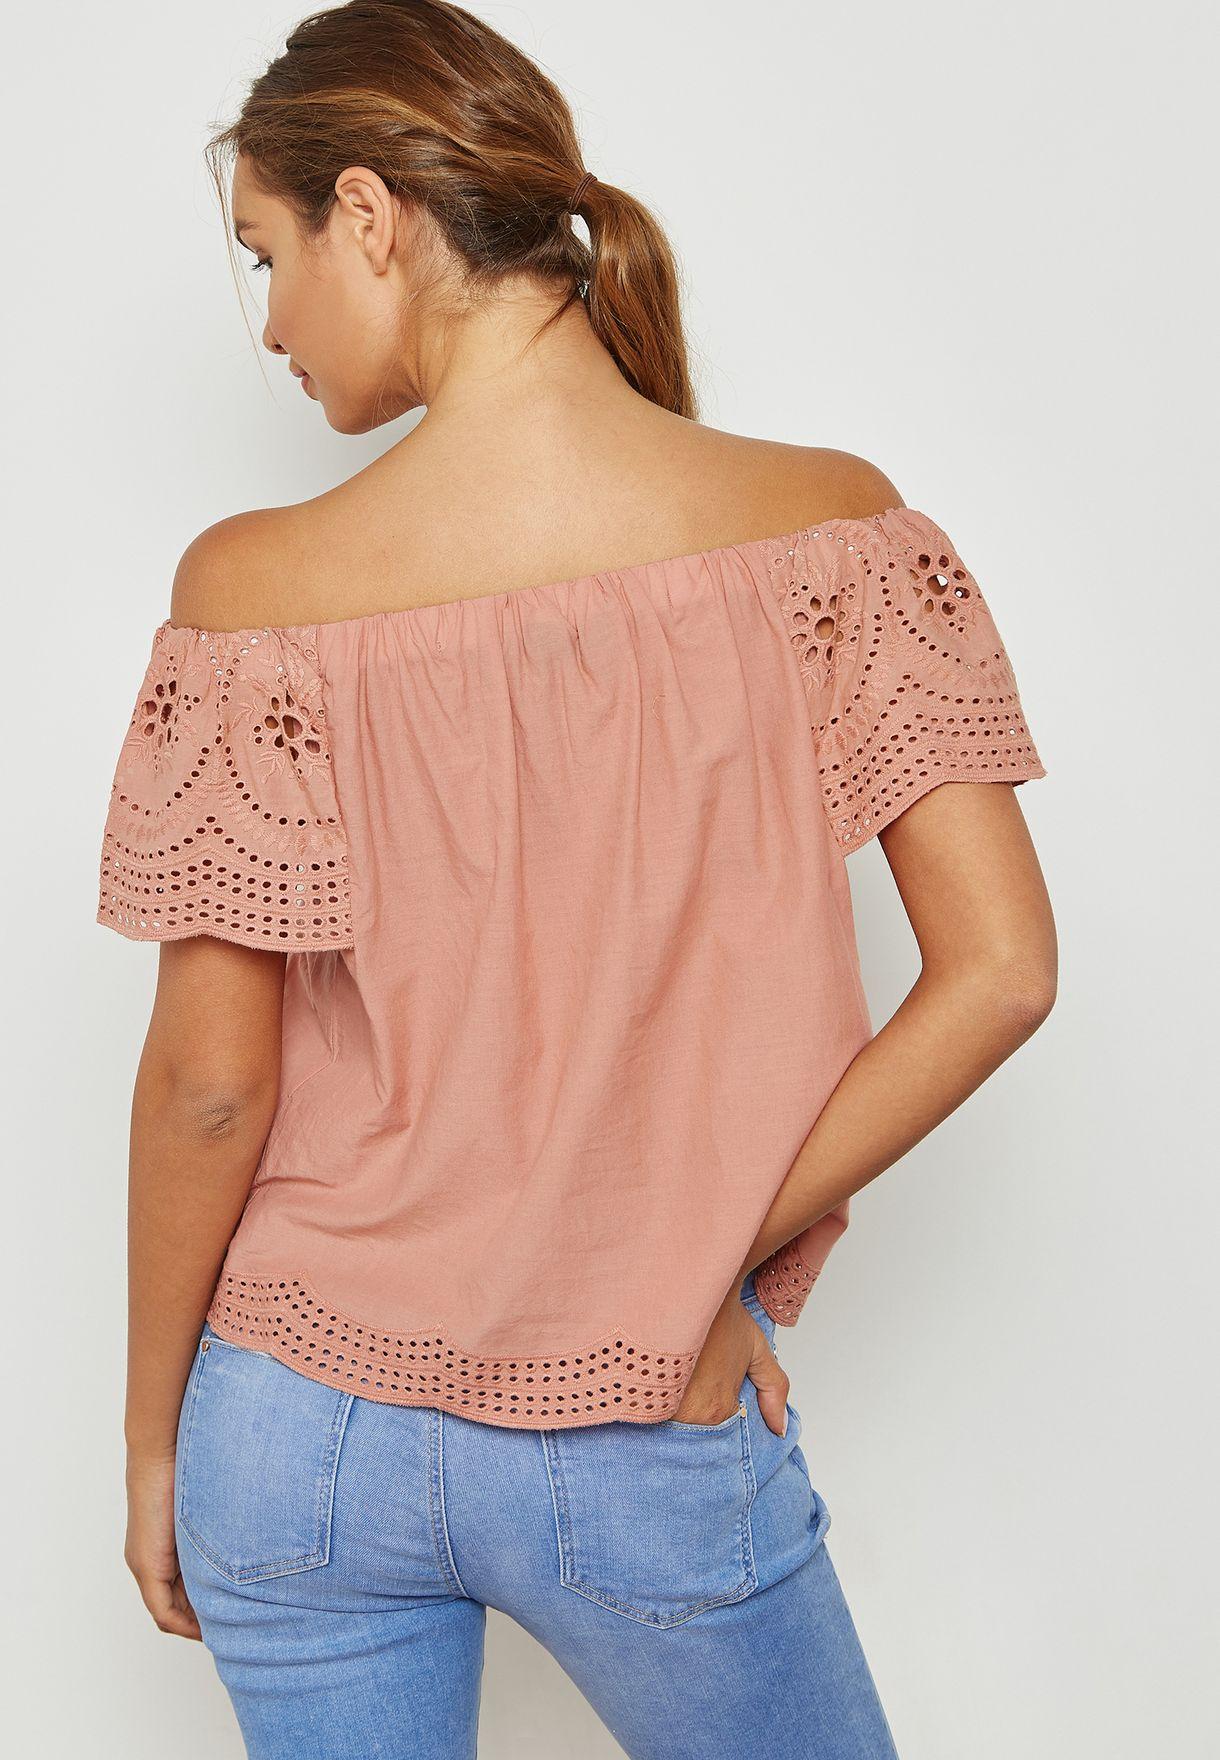 6484ed6d907 Shop Dorothy Perkins pink Frill Detail Broidery Bardot Top 67298514 ...